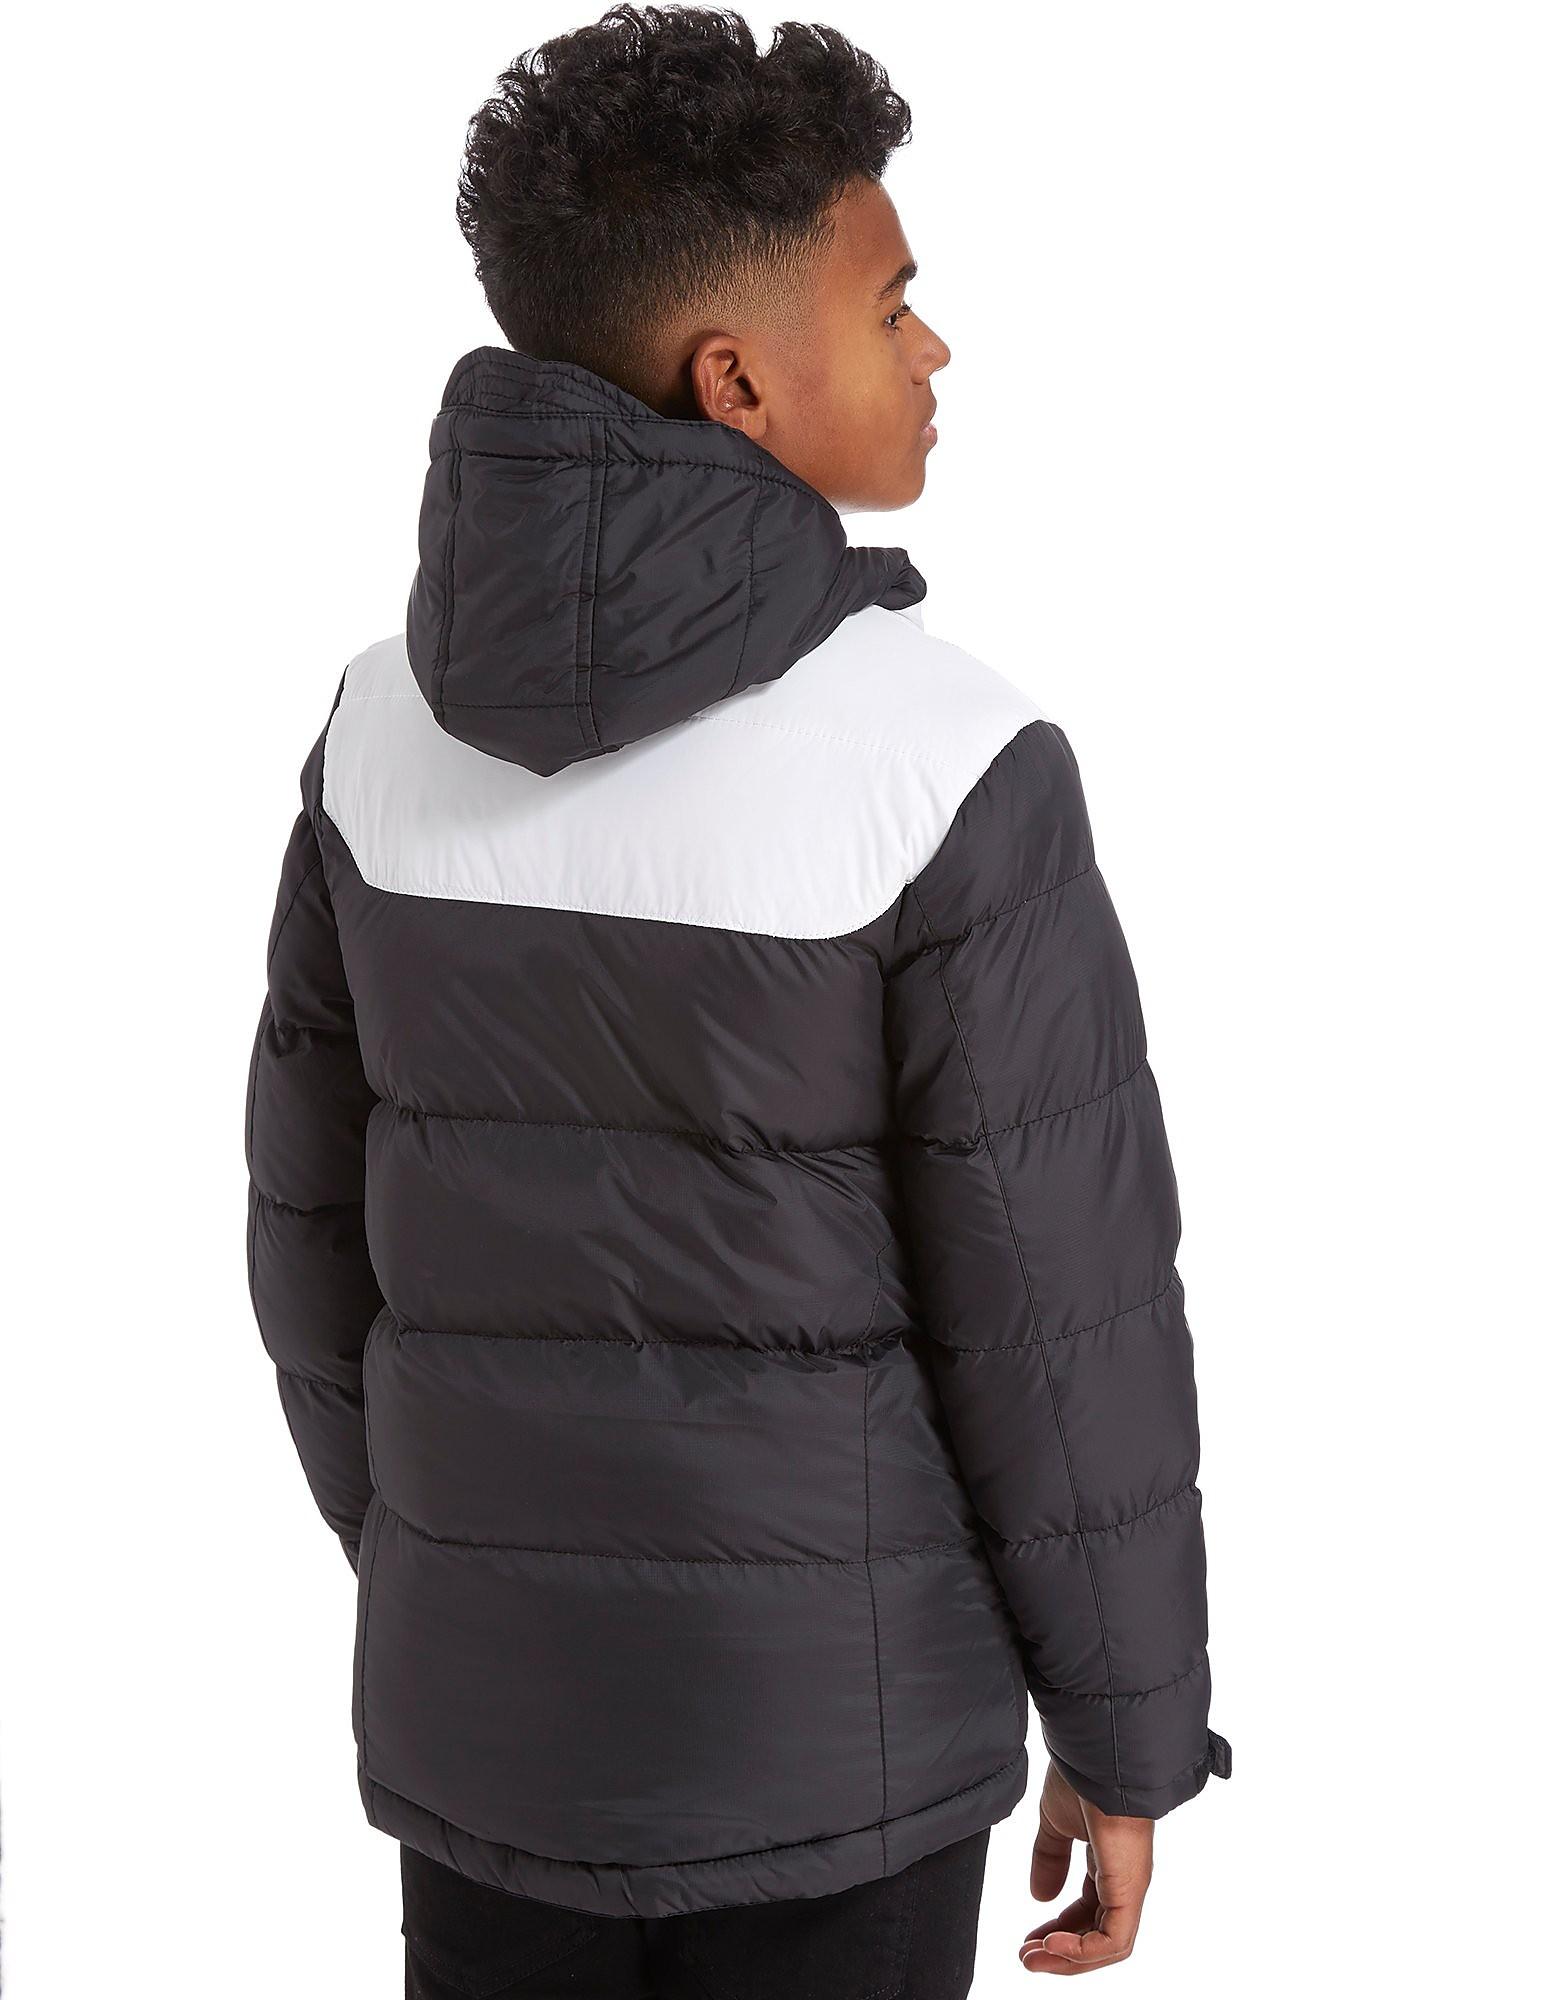 Sonneti Strata Jacket Junior